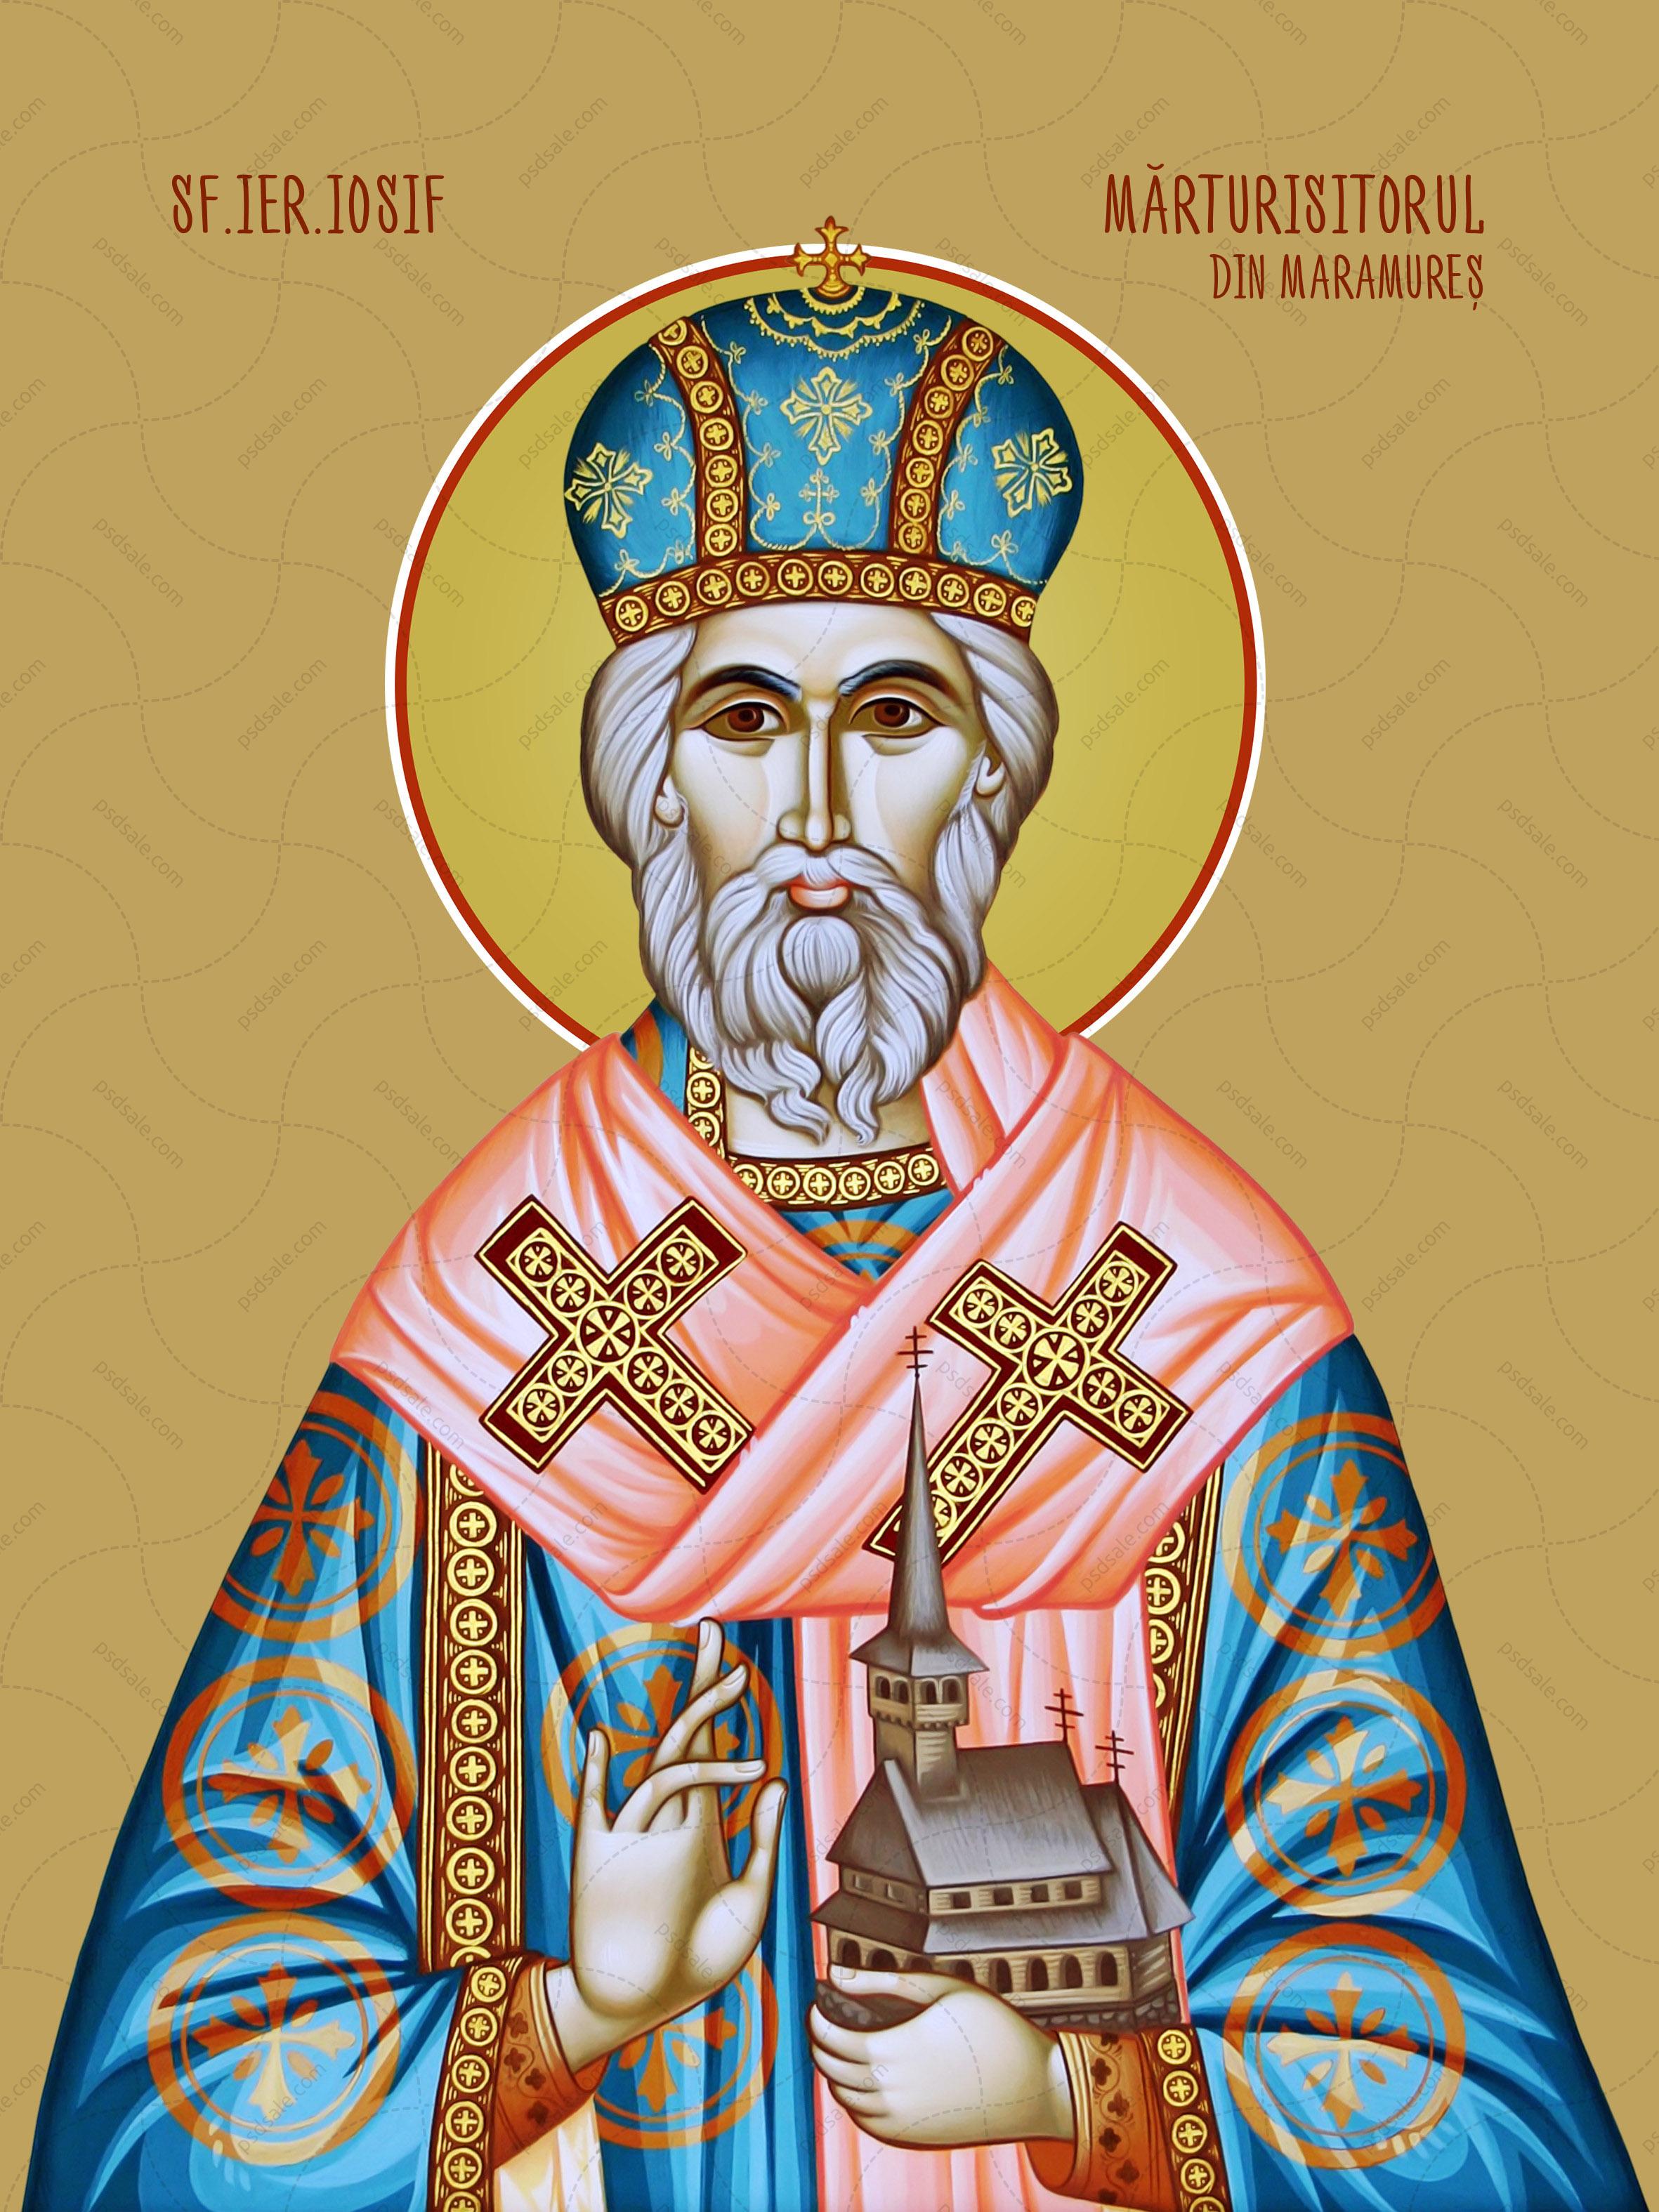 Иосиф Марамуреш / Sf. Iosif Mărturisitorul